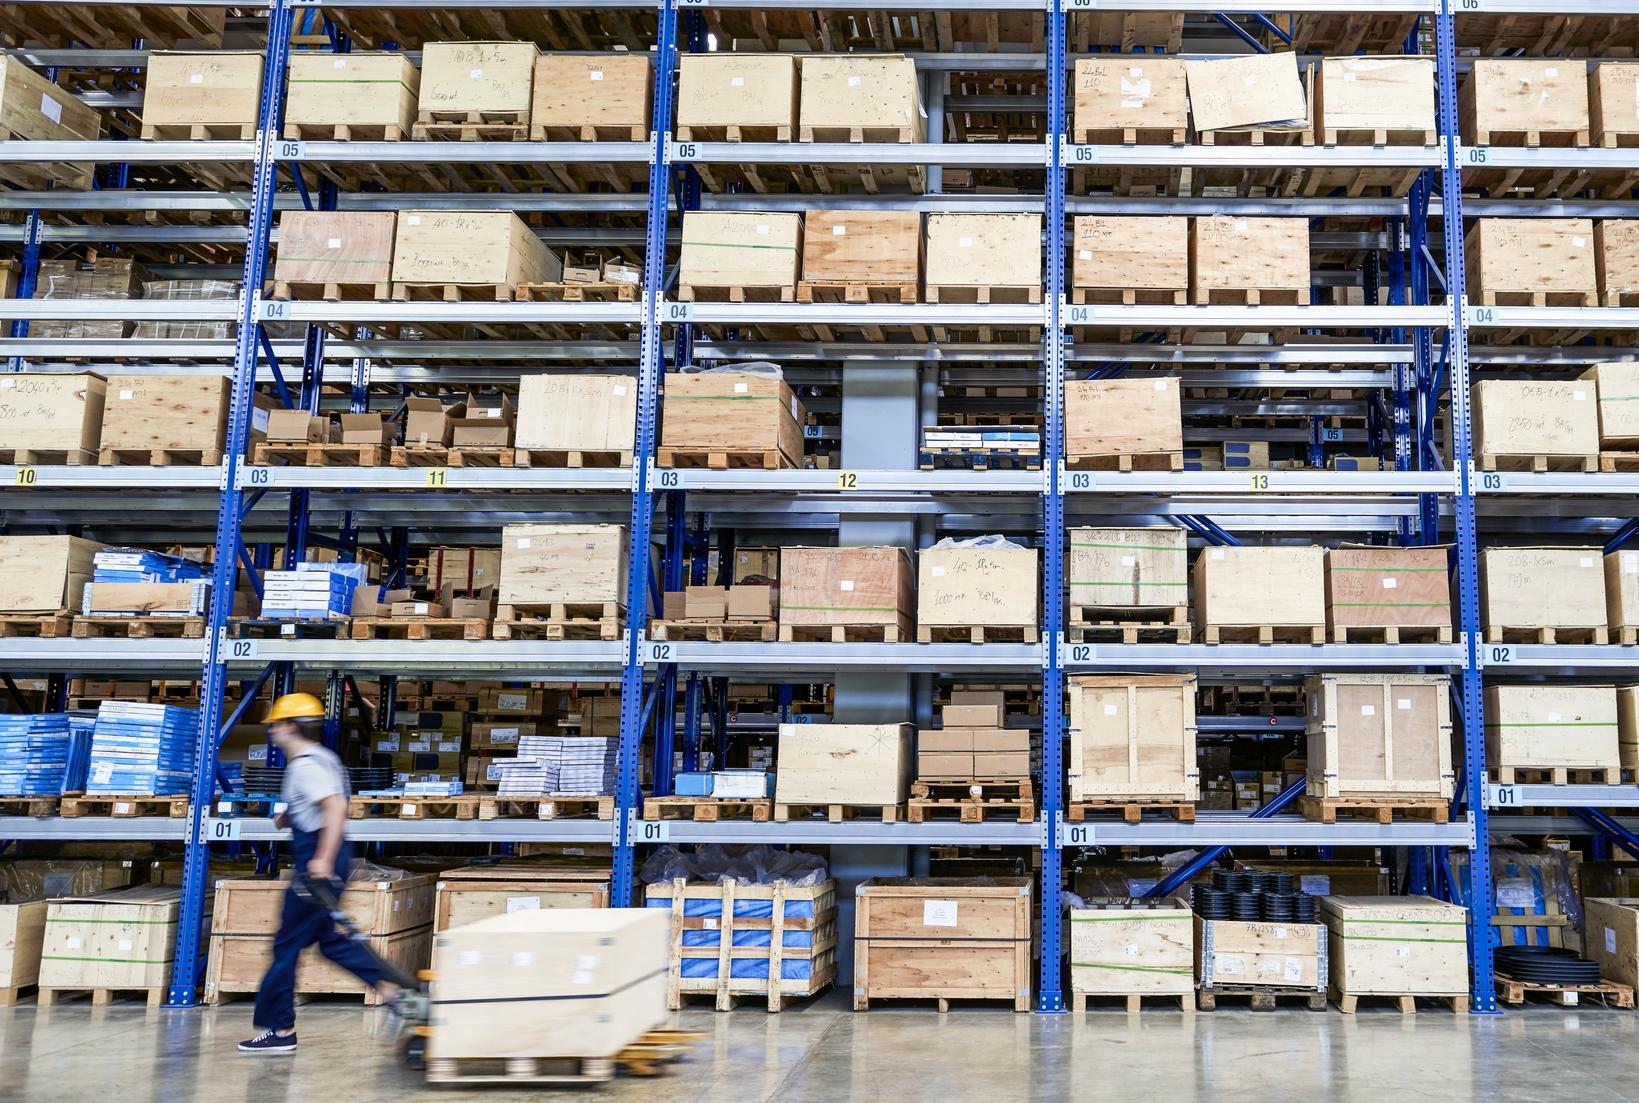 Warehouse Location Optimization